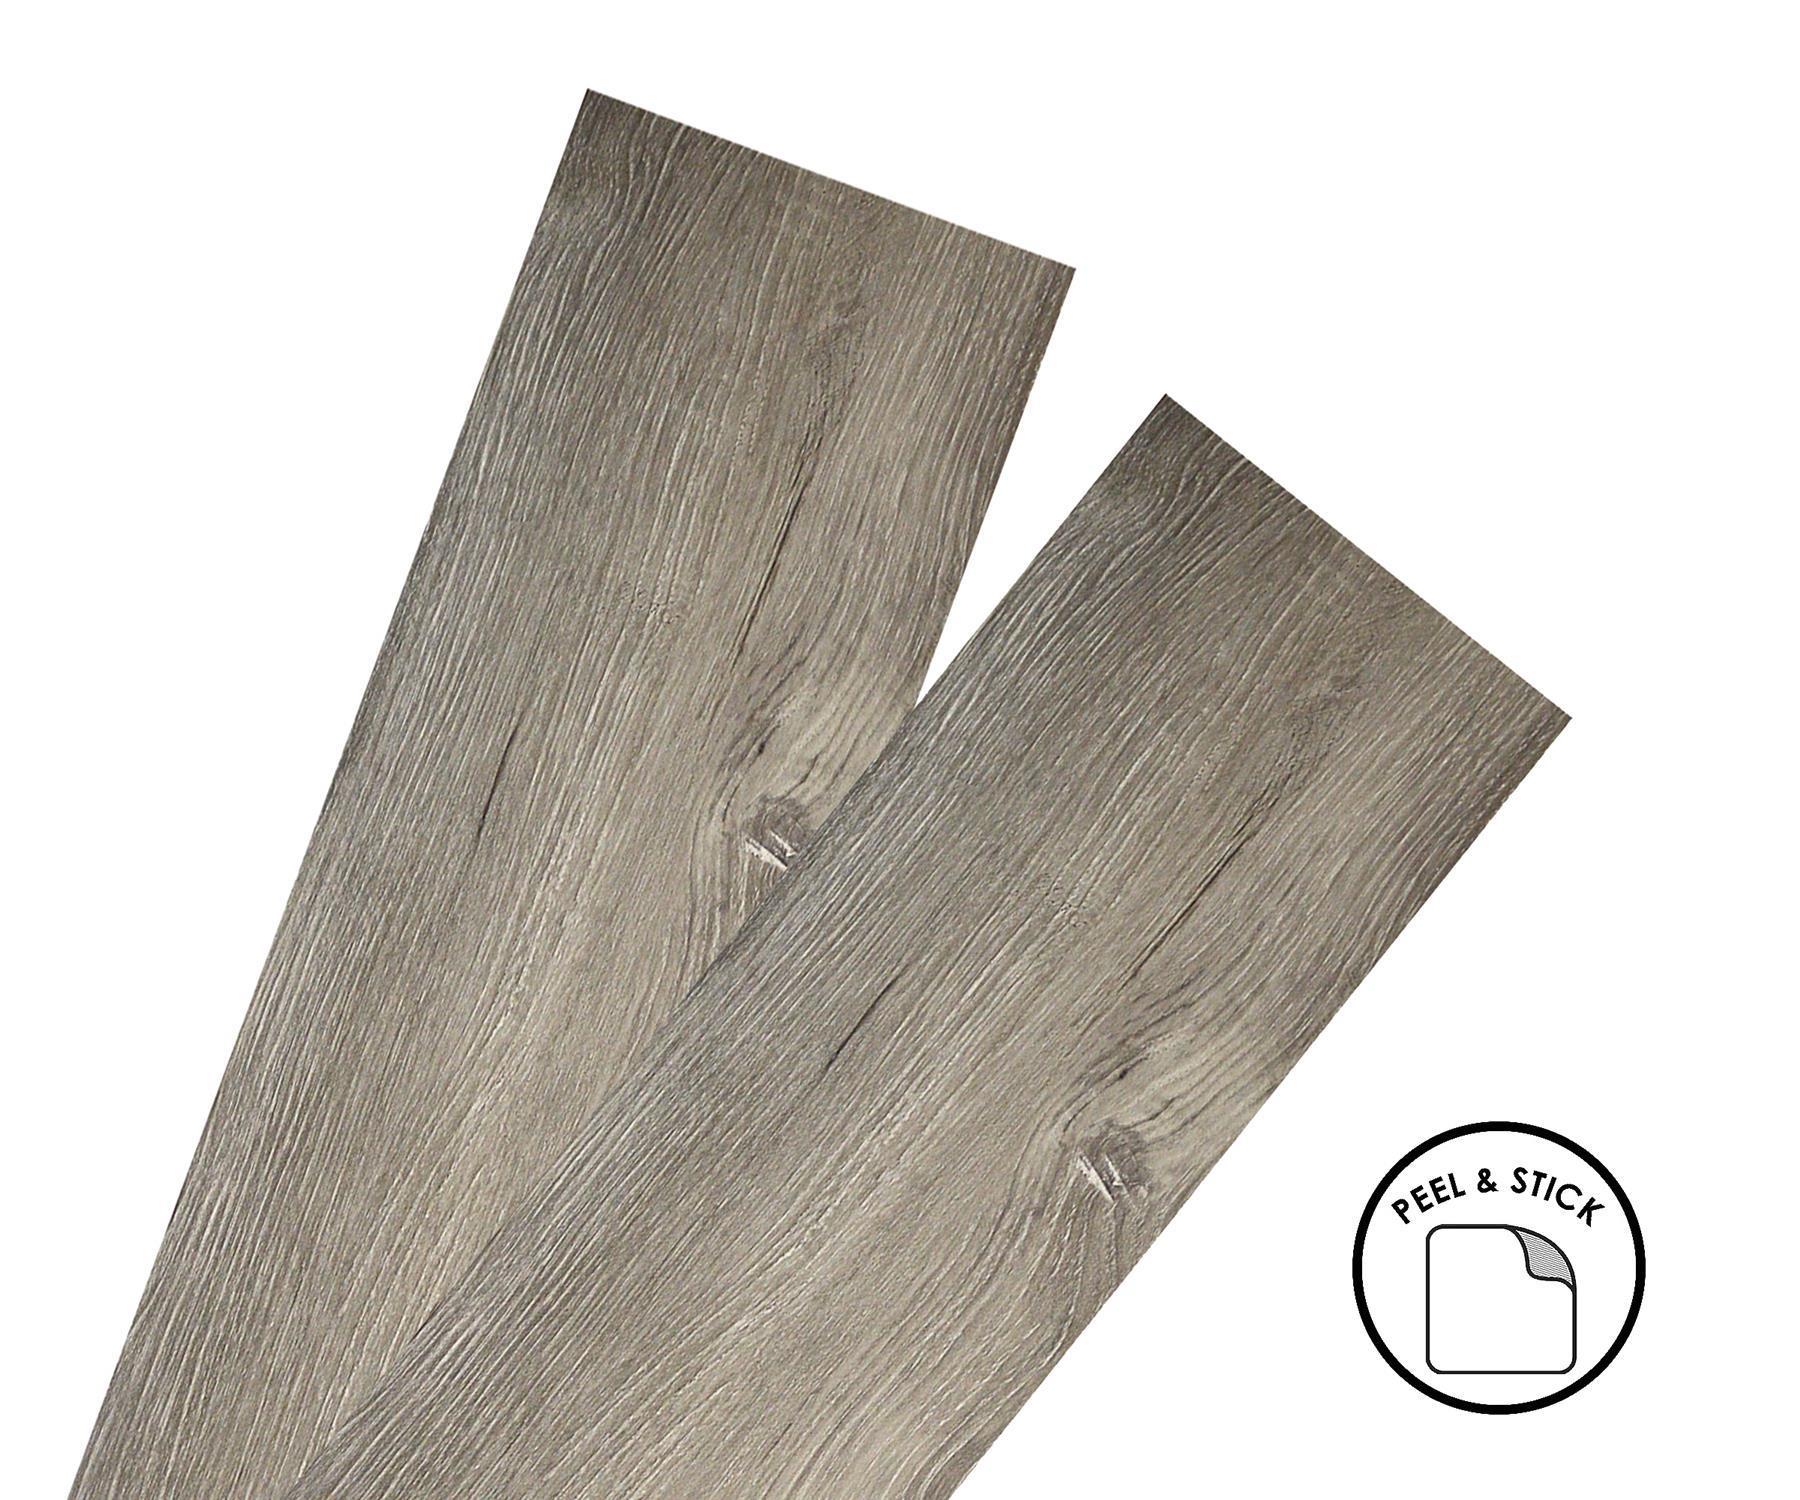 thumbnail 14 - Floor Planks Tiles Self Adhesive Dark Grey Wood Vinyl Flooring Kitchen Bathroom